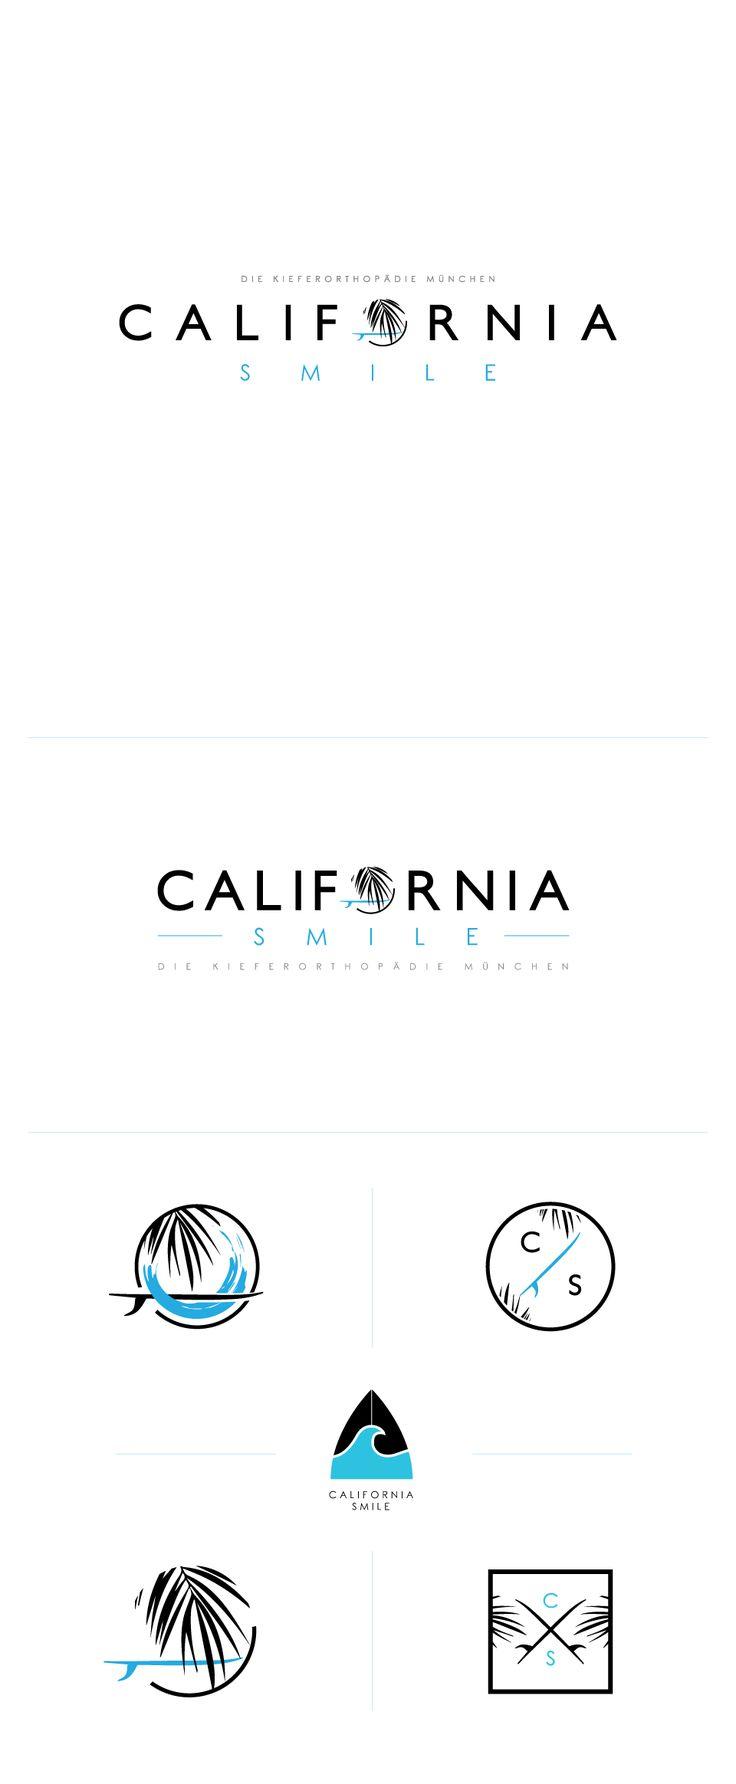 Logo design contest winner / California smile | 99 designs